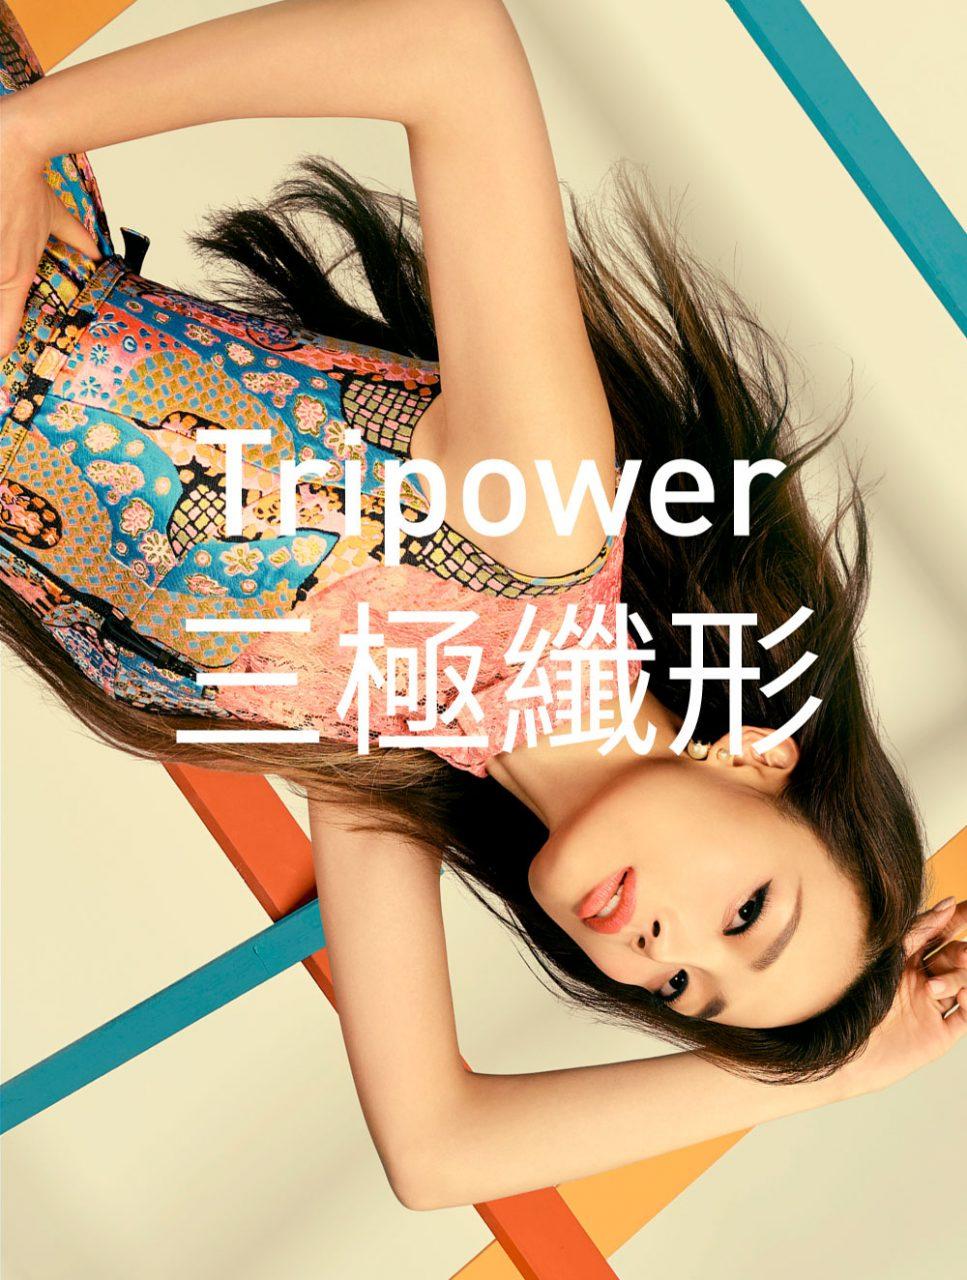 Tripower三極纖形科技